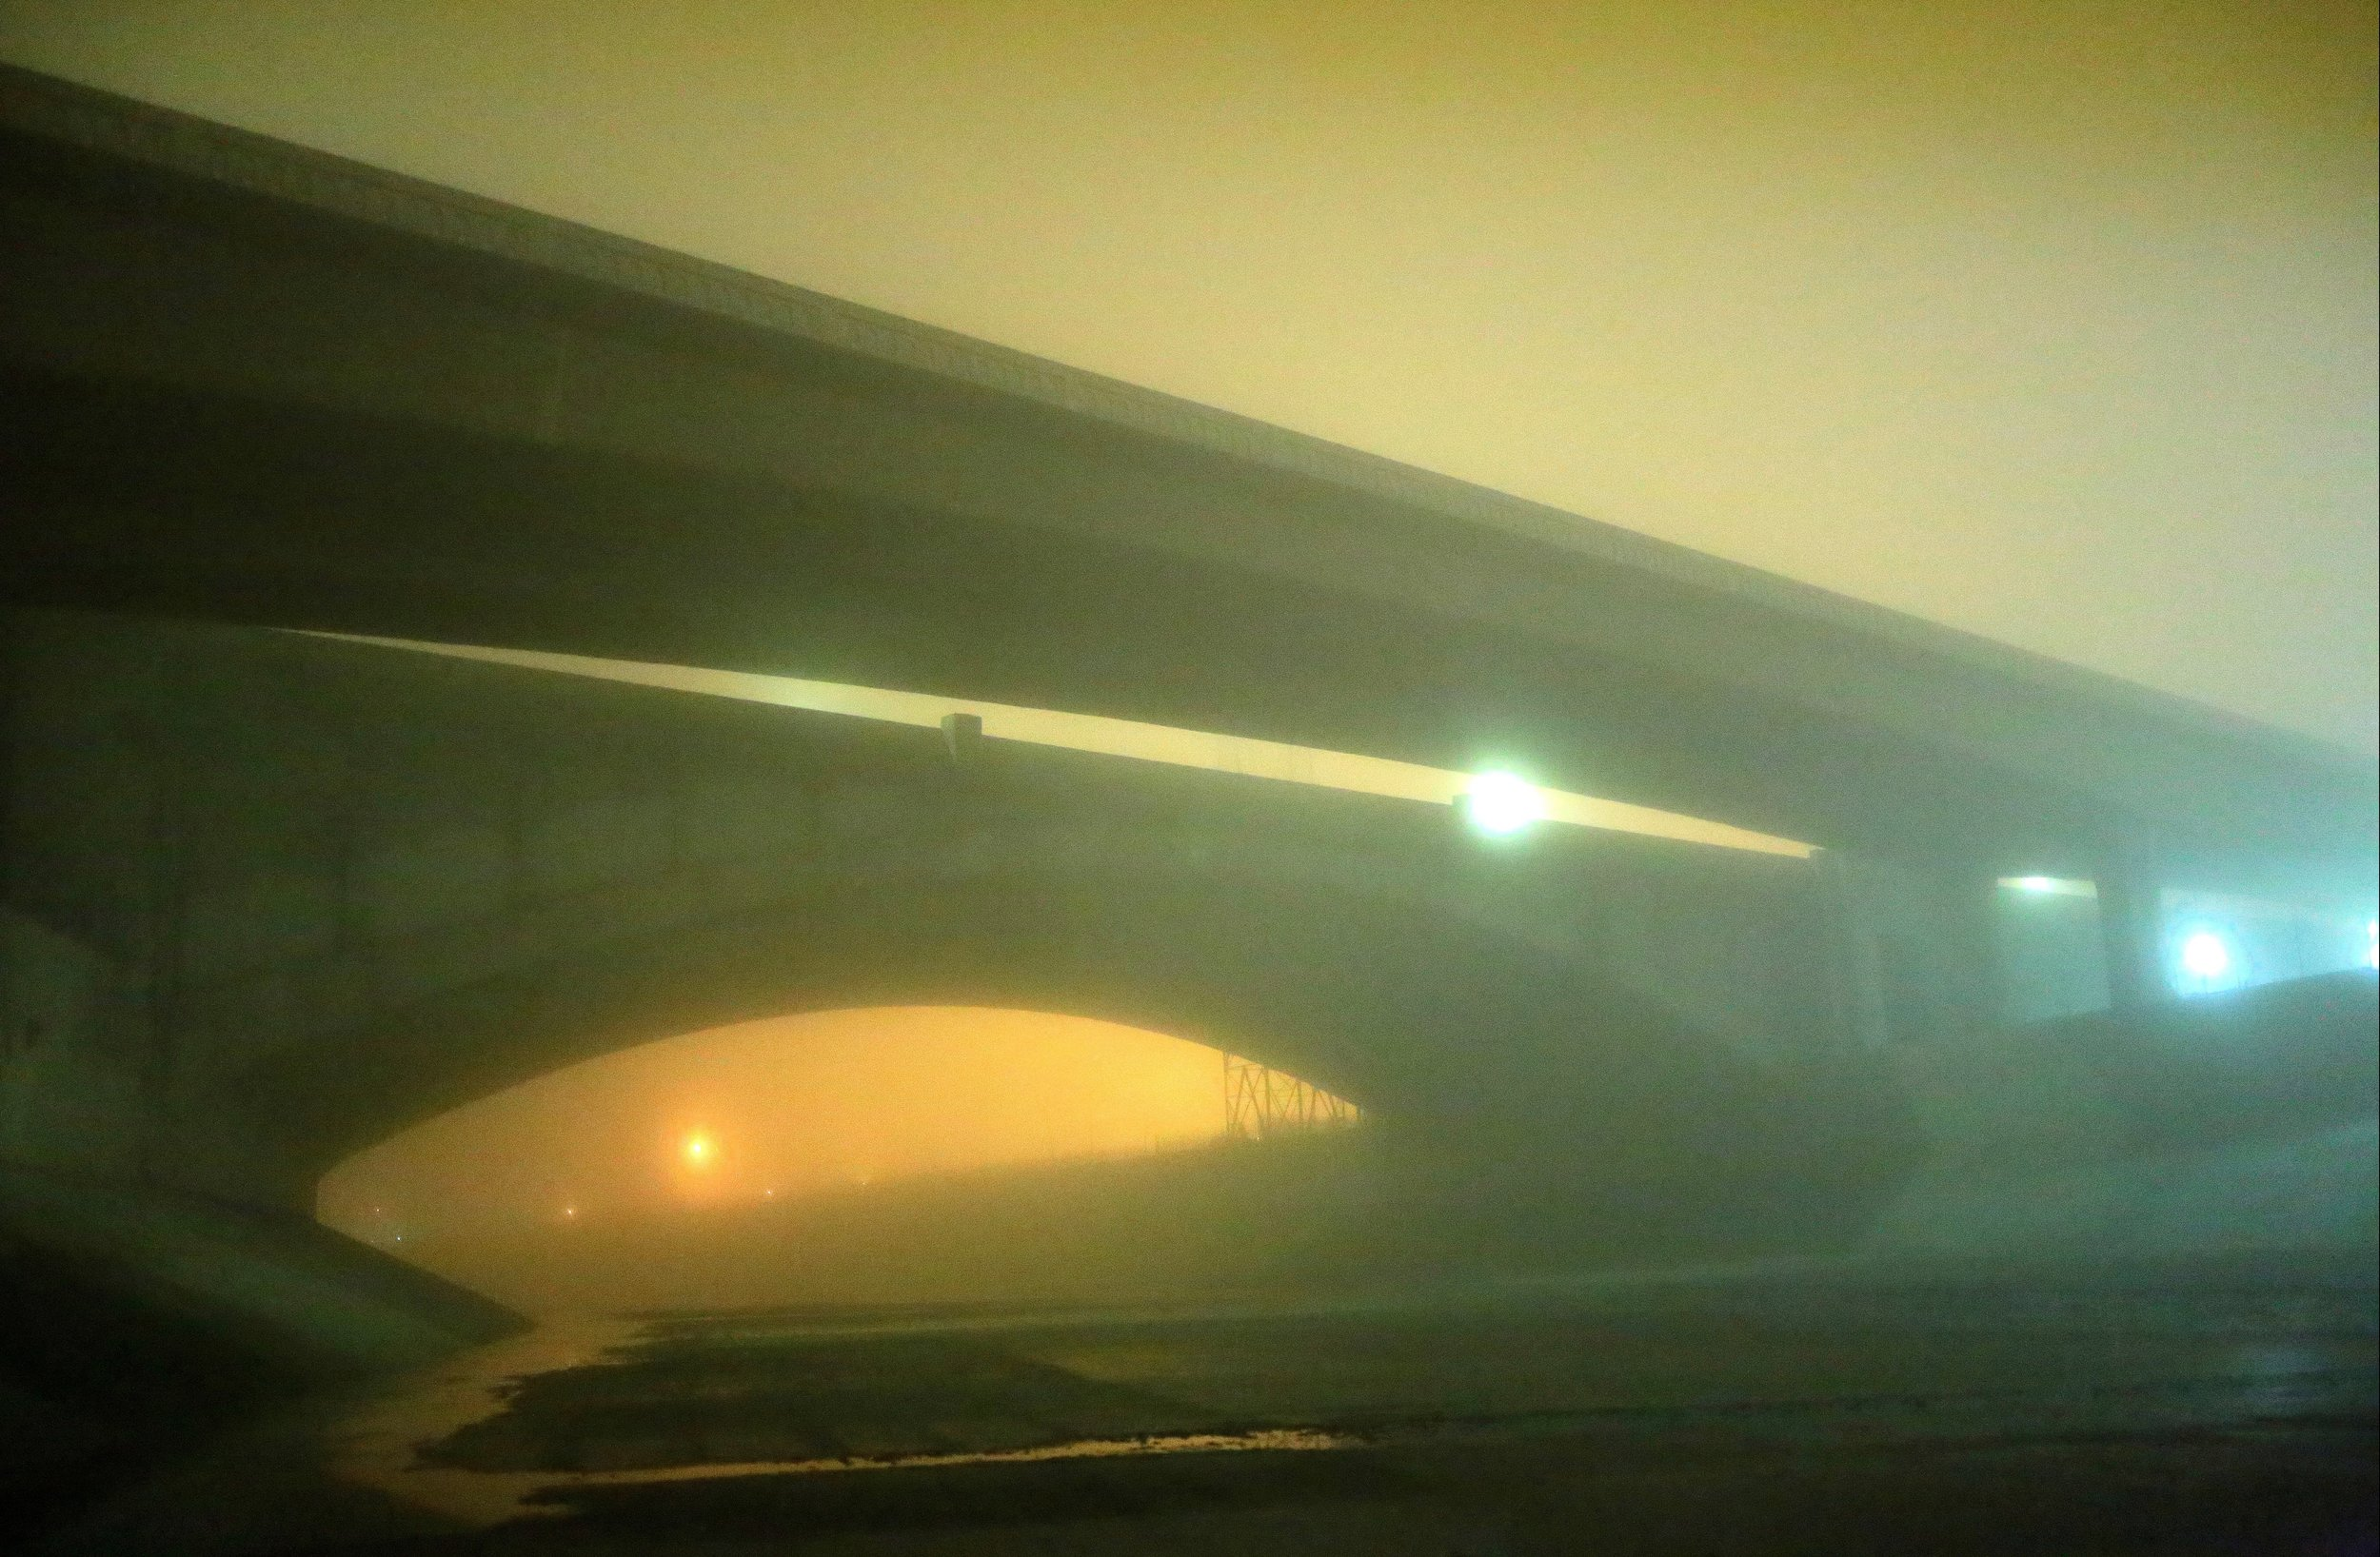 101 freeway and Aliso Street bridge